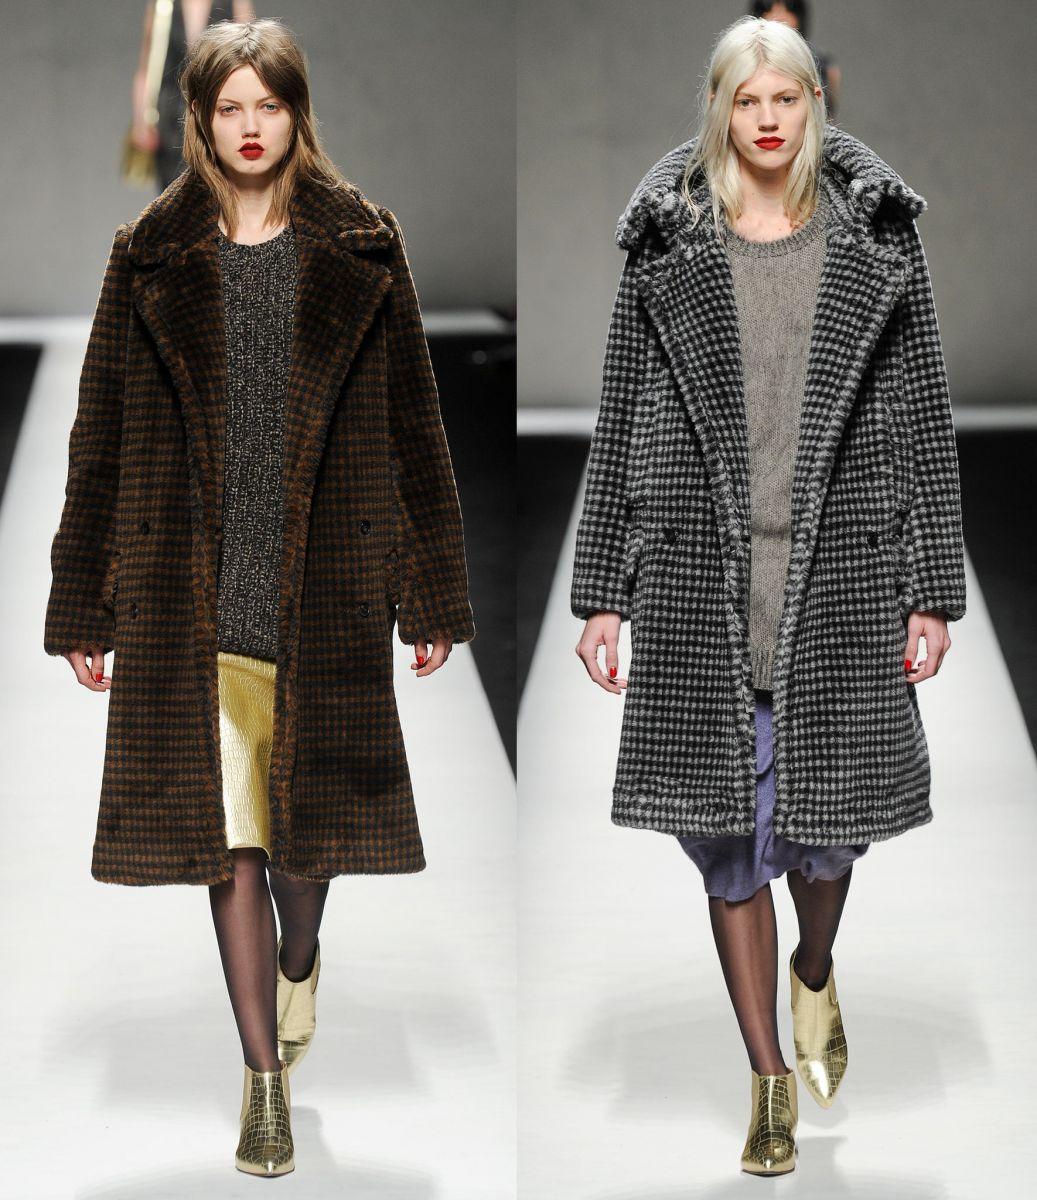 Пальто Max Mara - фото №2